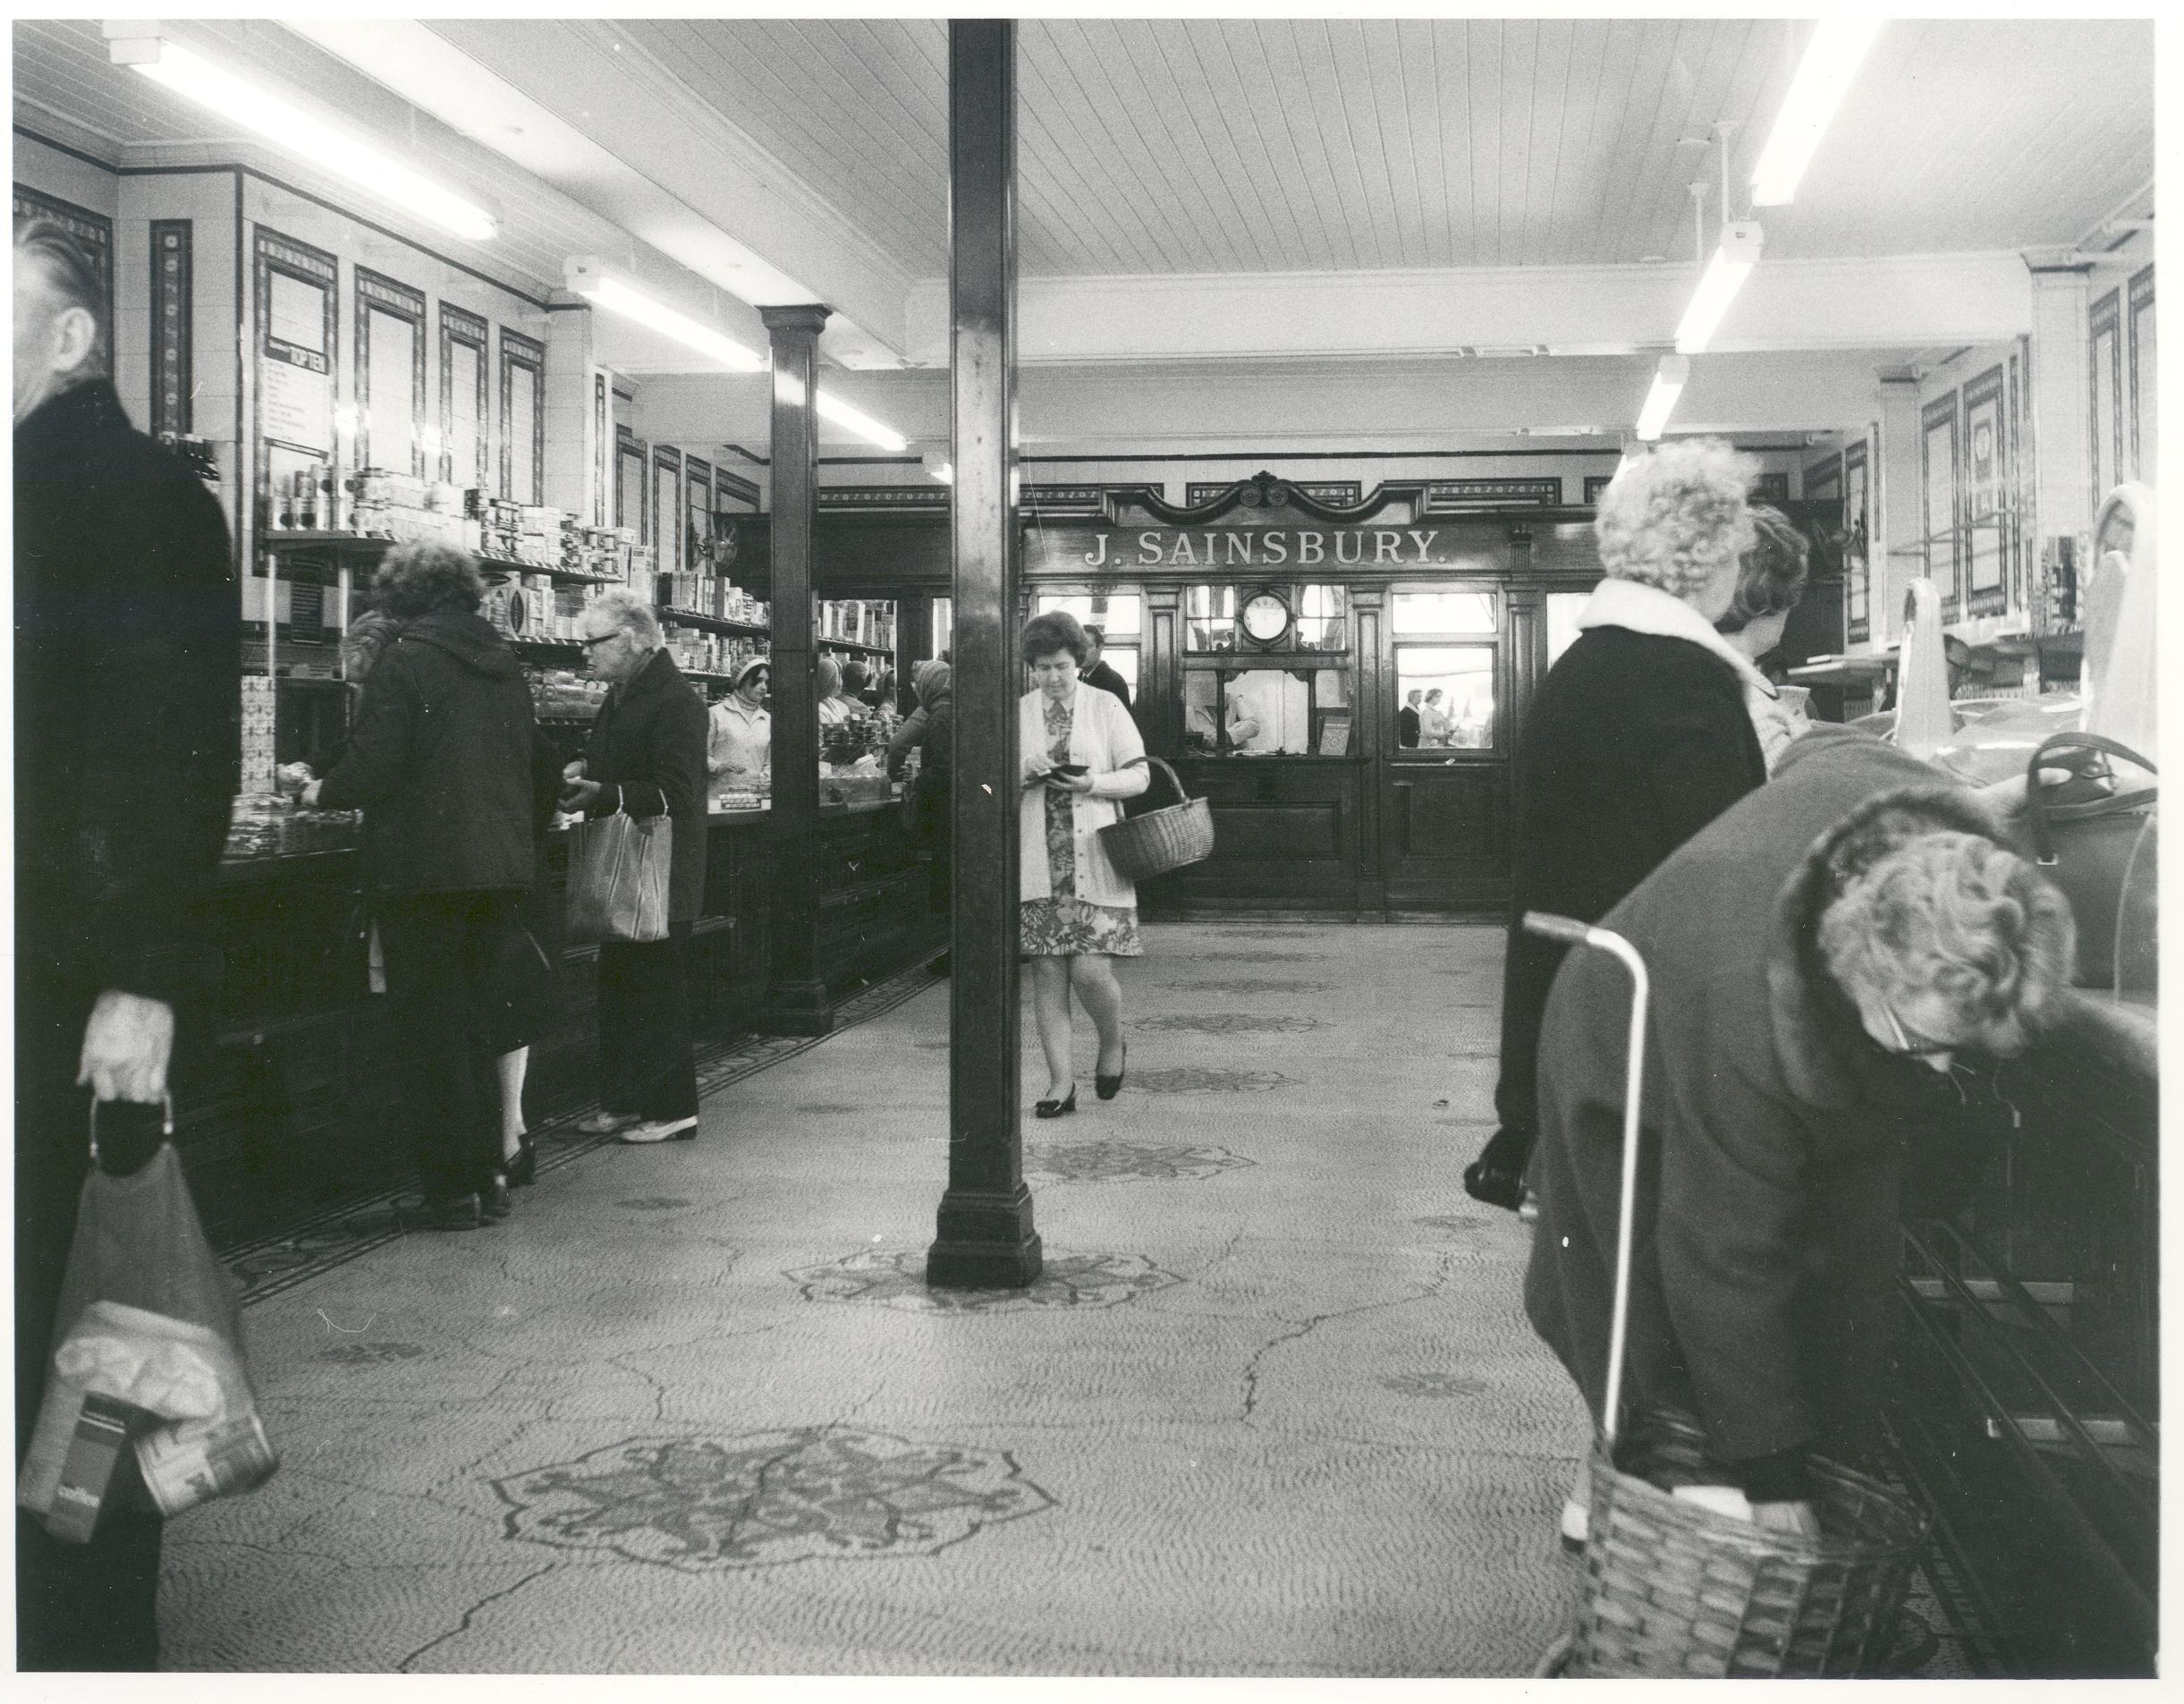 Inside of J. Sainsbury's shop in Weybridge High Street, c.1970s.